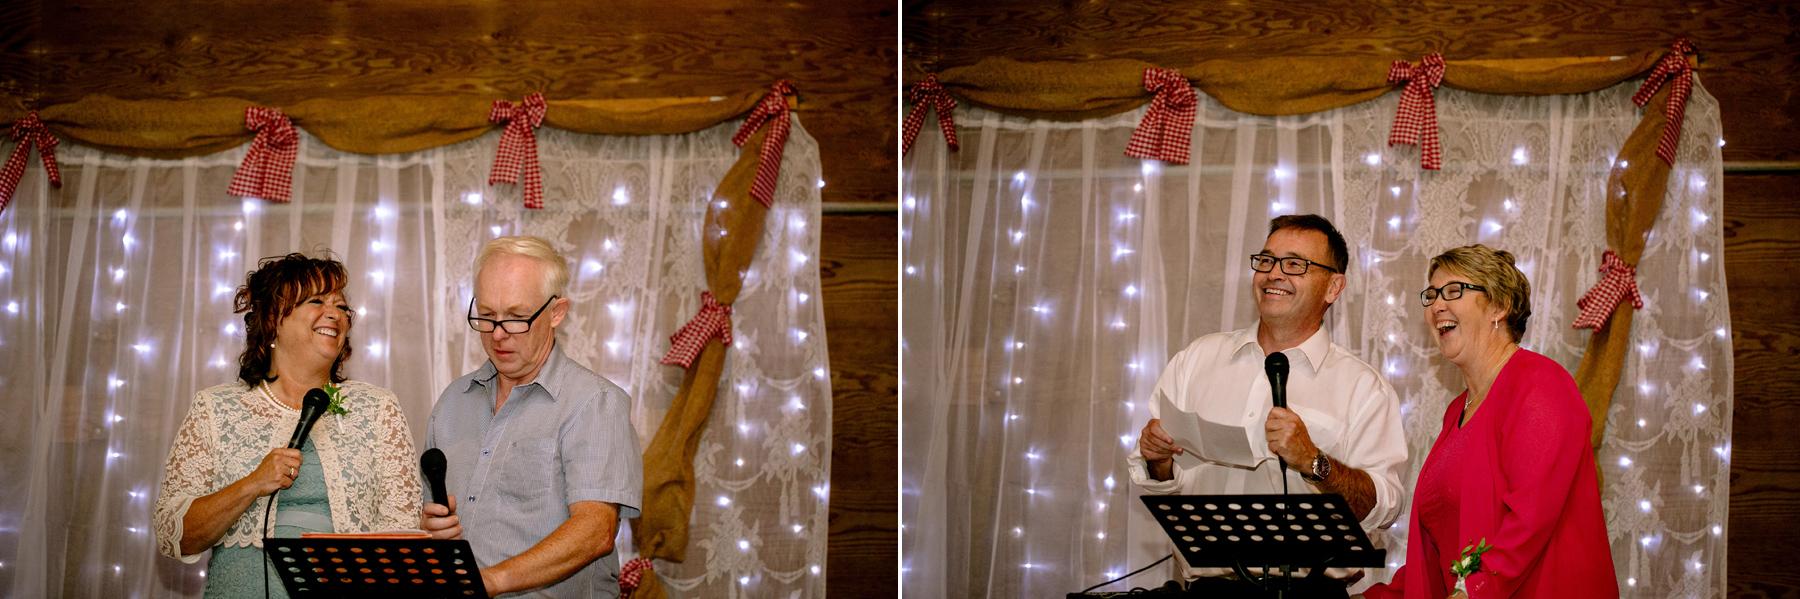 068-awesome-pei-wedding-photography-kandisebrown-jg2016